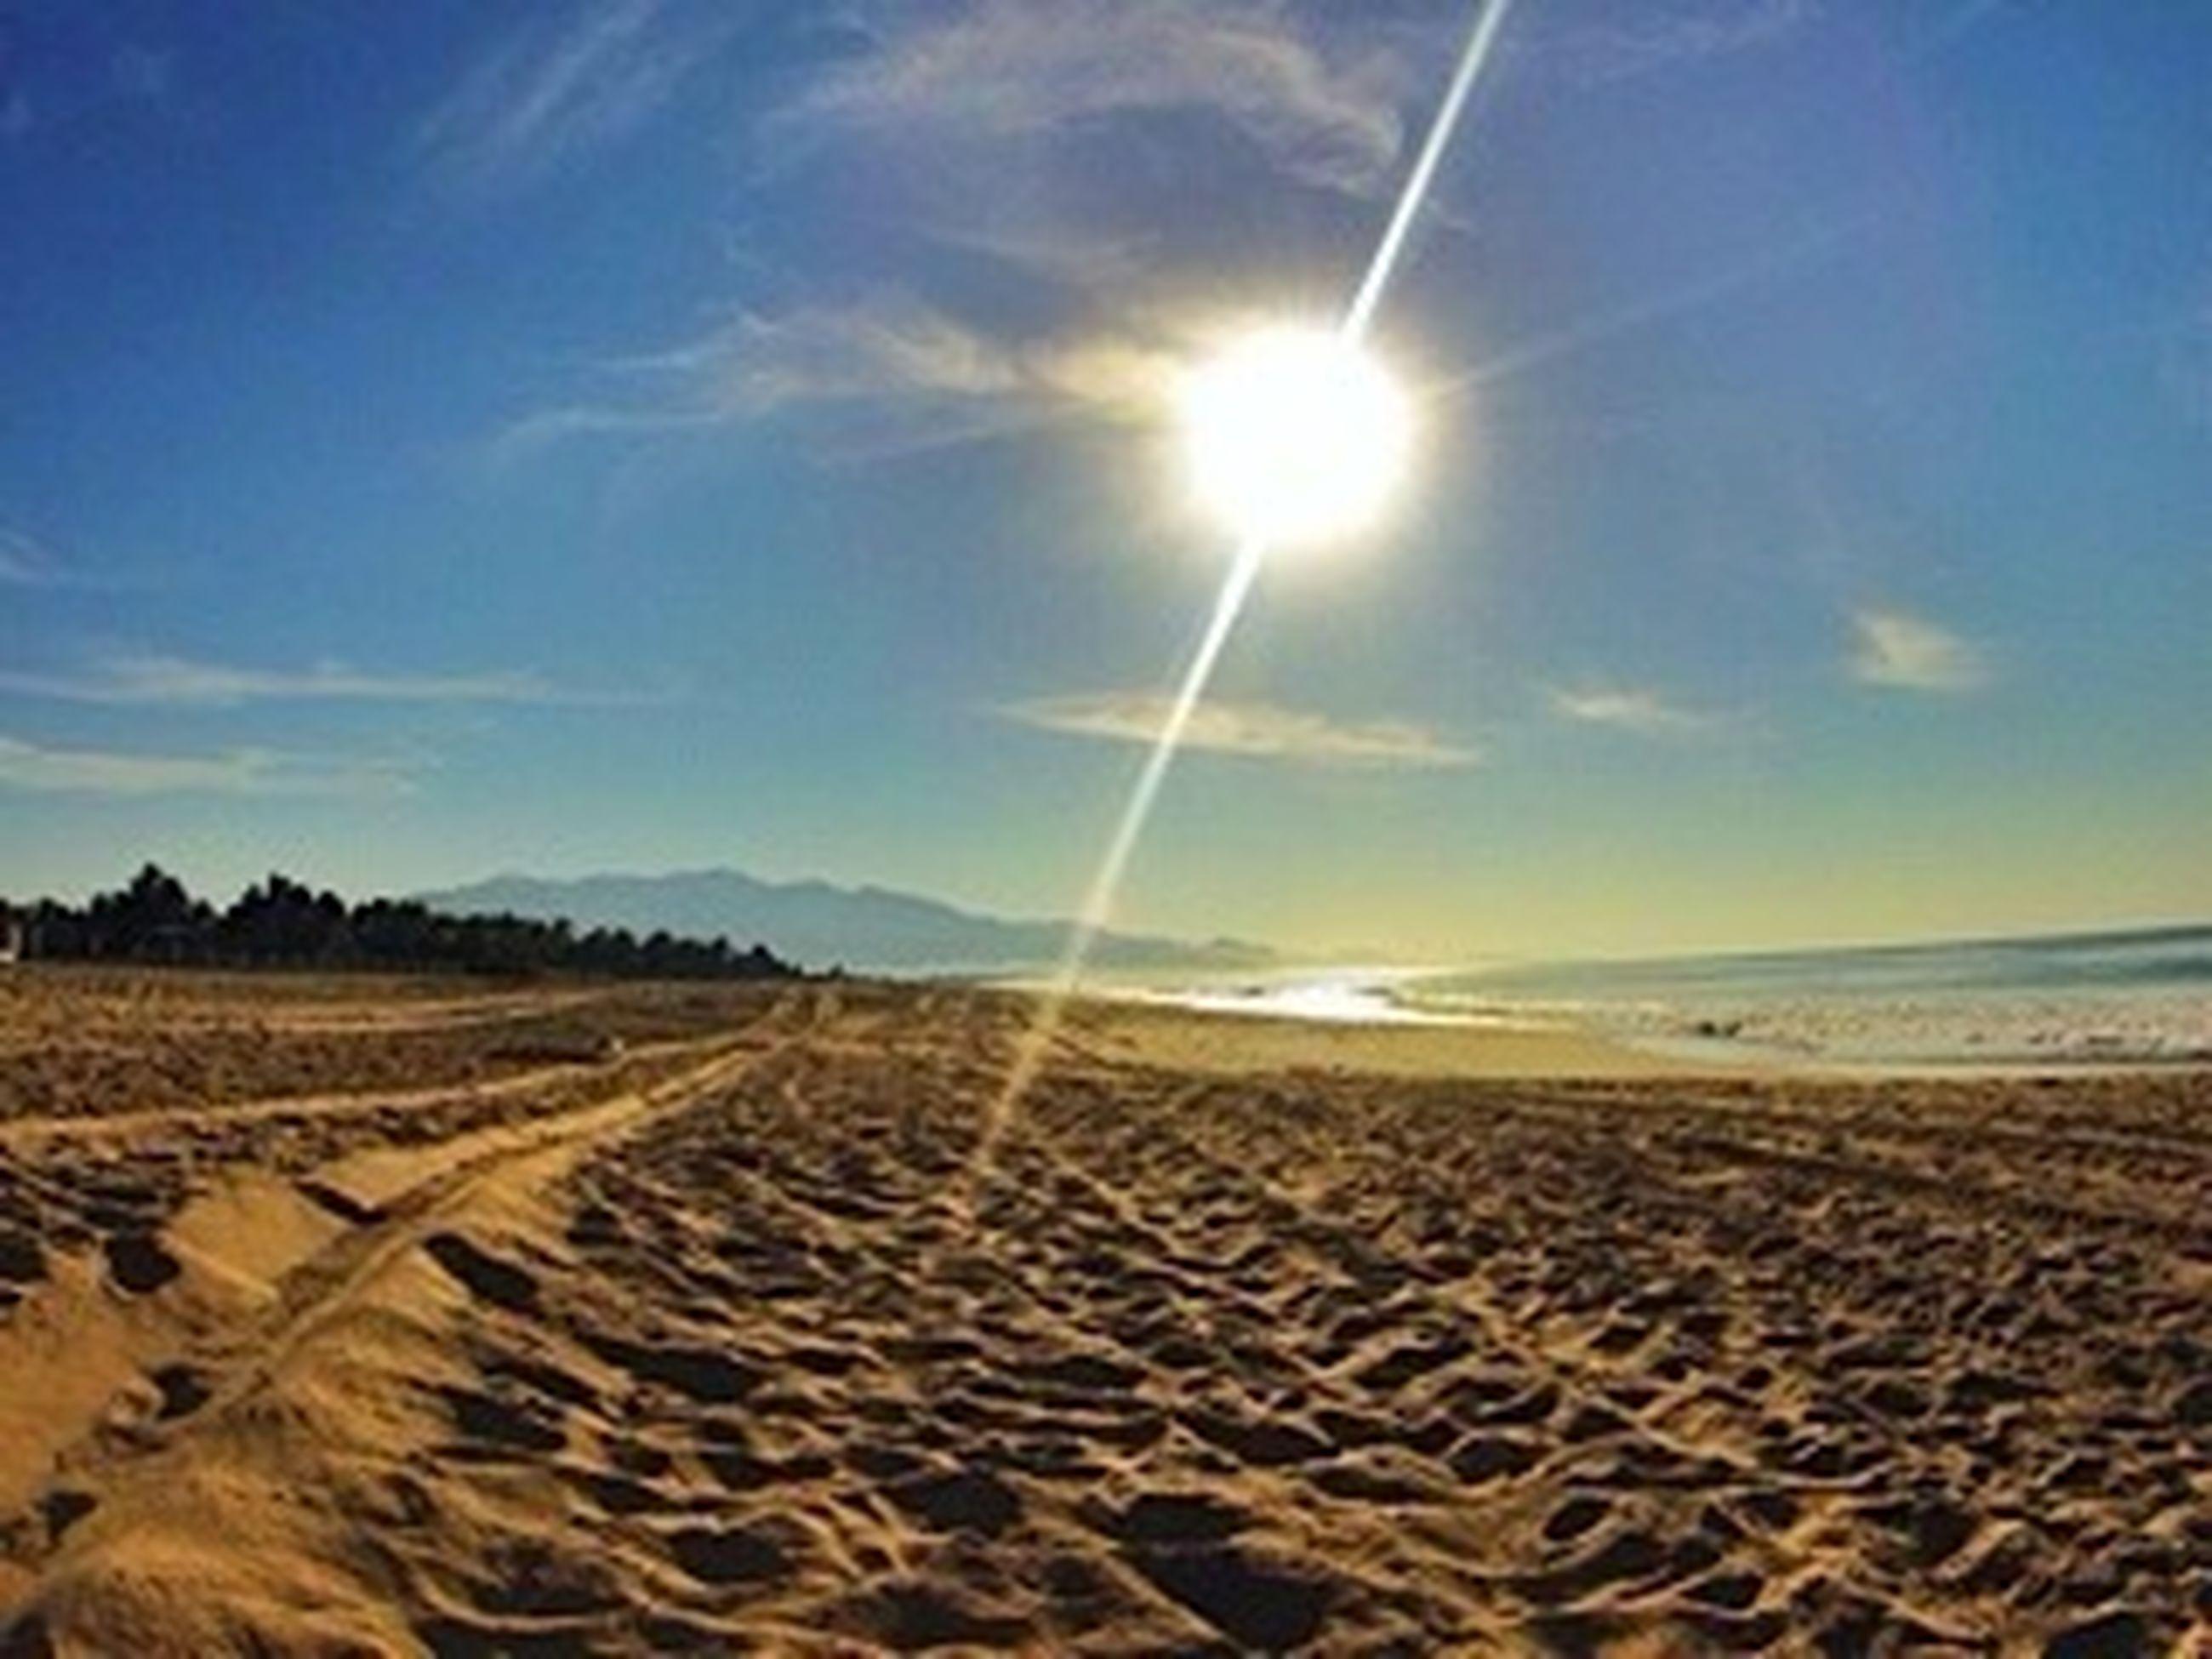 sand, beach, sun, sunlight, sky, tranquility, tranquil scene, sunbeam, scenics, nature, beauty in nature, landscape, shore, sunny, lens flare, sea, cloud, horizon over water, desert, cloud - sky